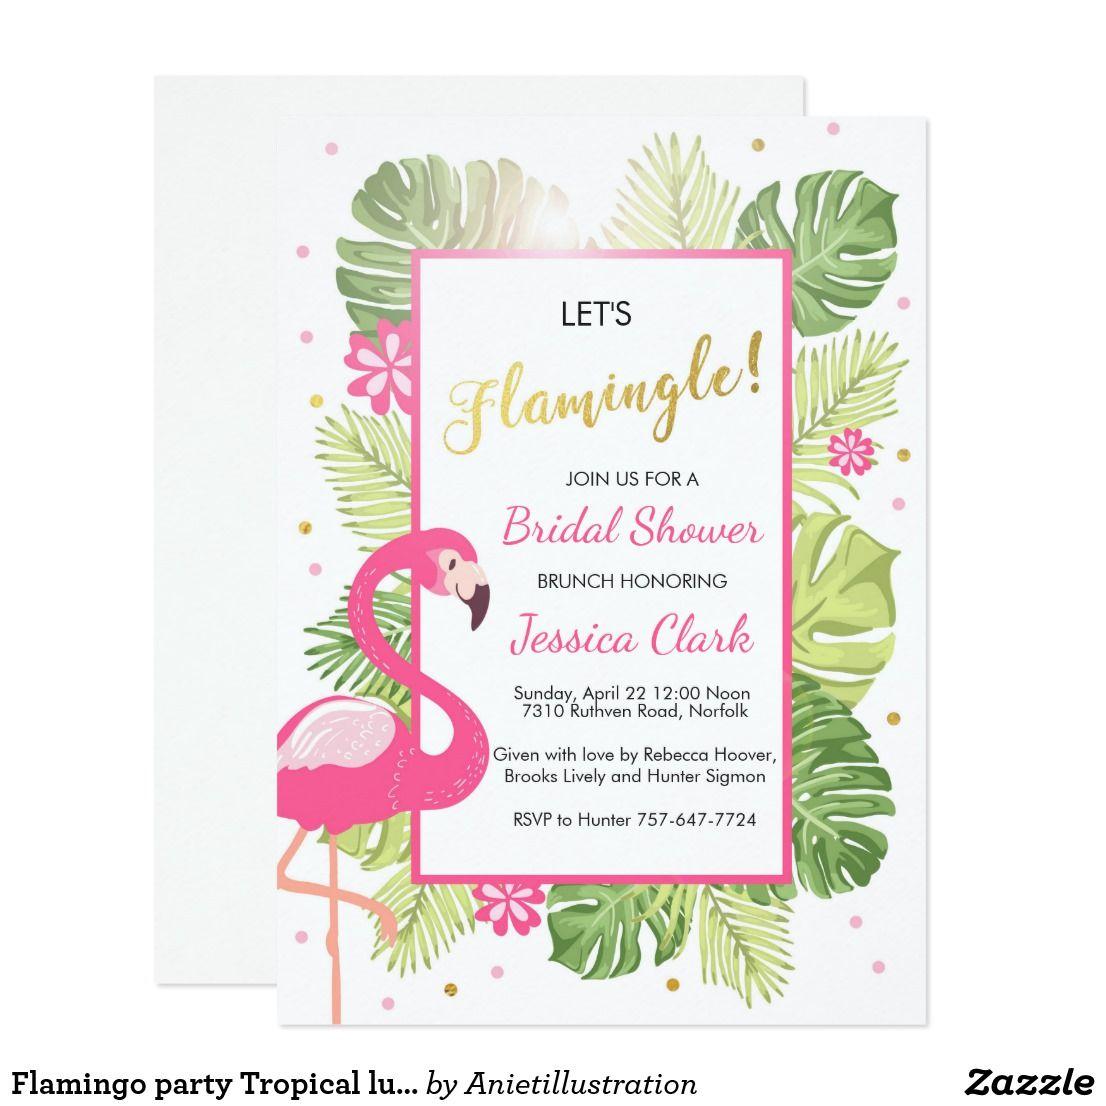 Flamingo party Tropical luau Bridal shower invite | Flamingo party ...